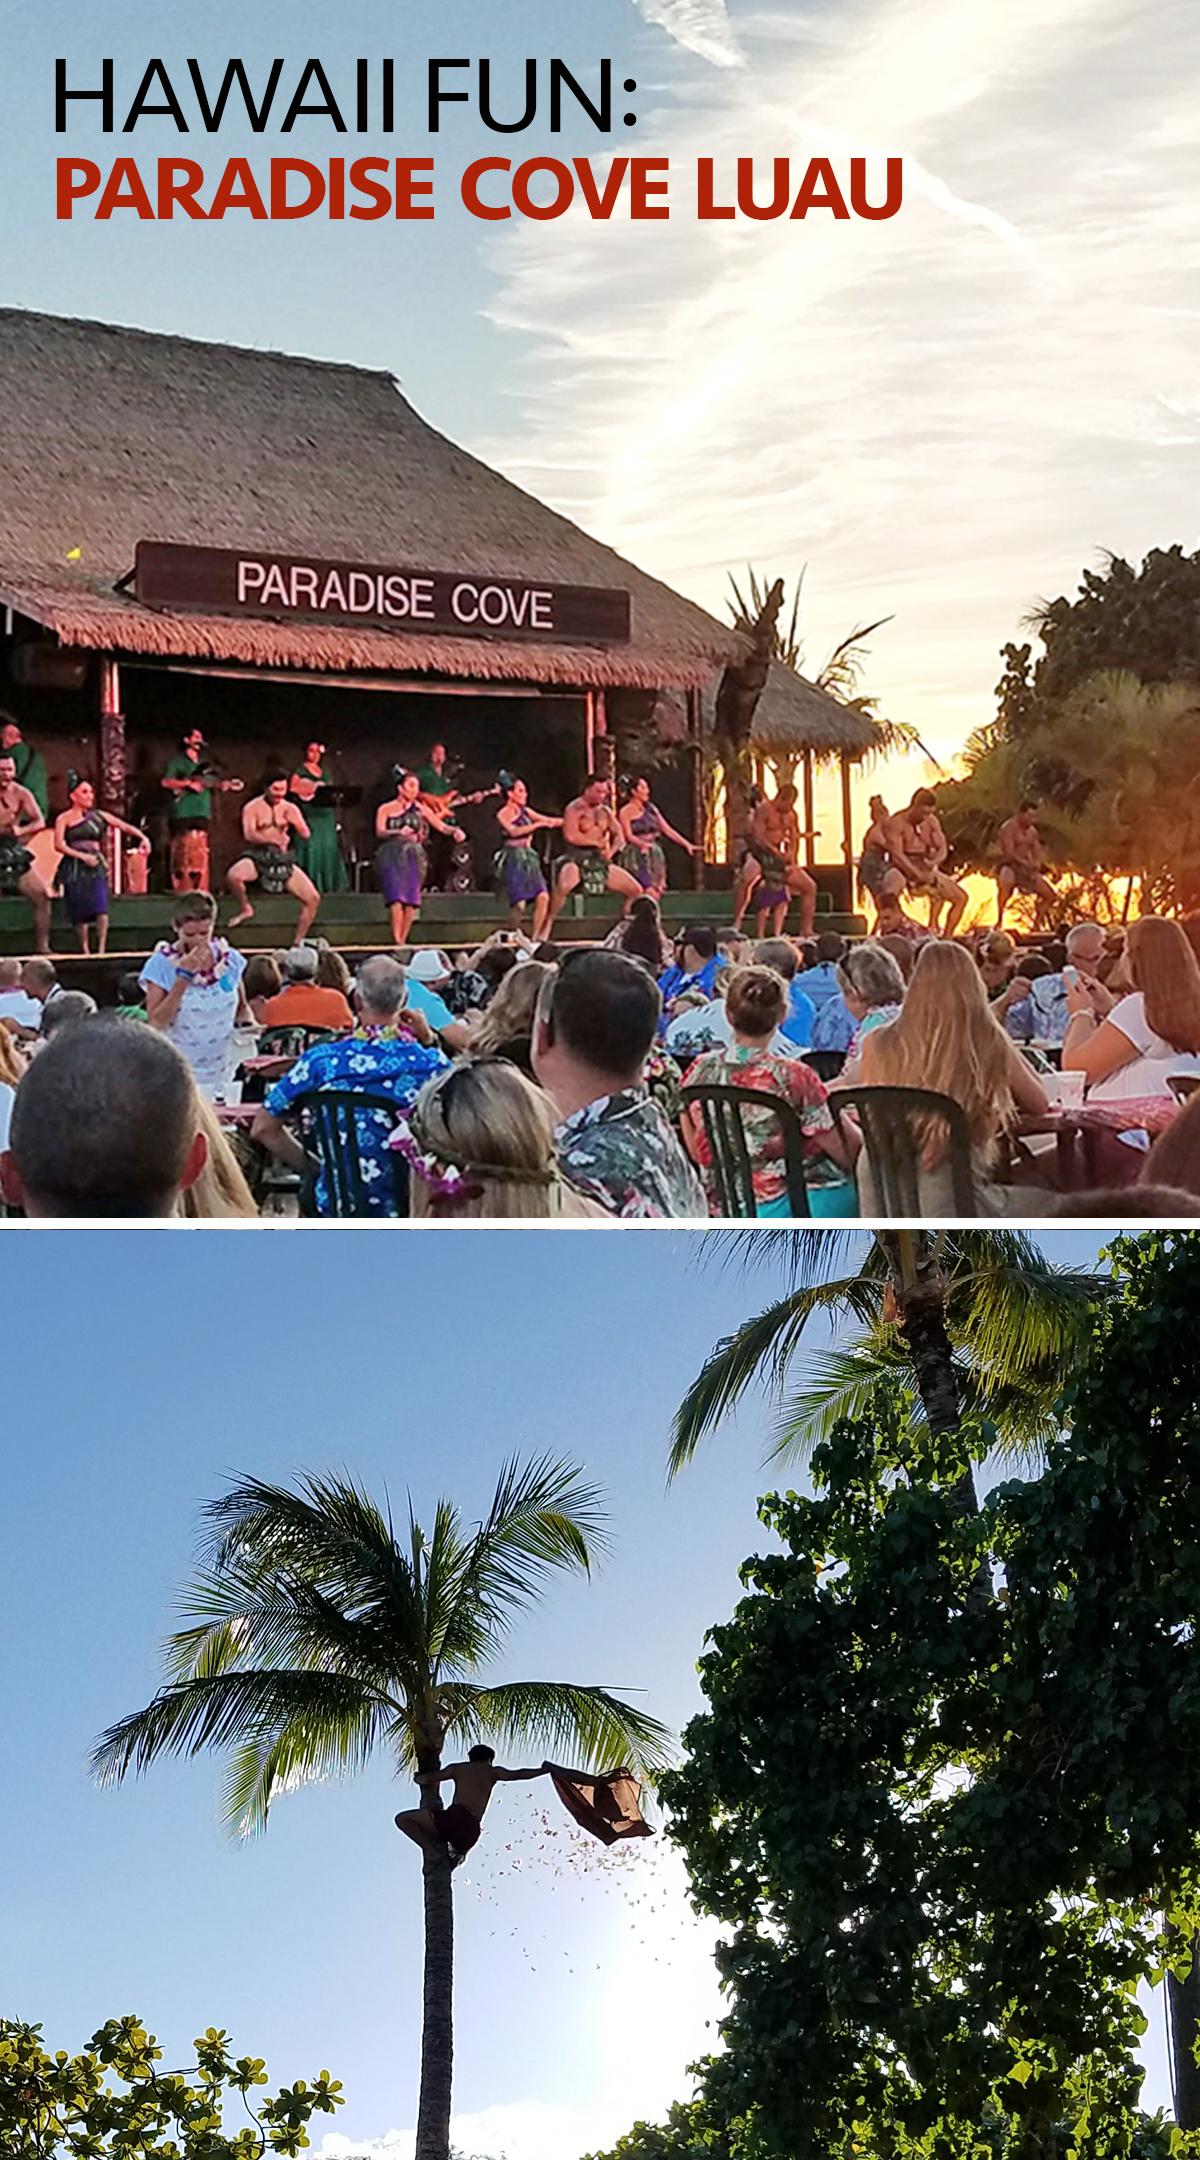 Pinterest Home Design Lover Hawaii Fun Paradise Cove Luau Aloha Lovely